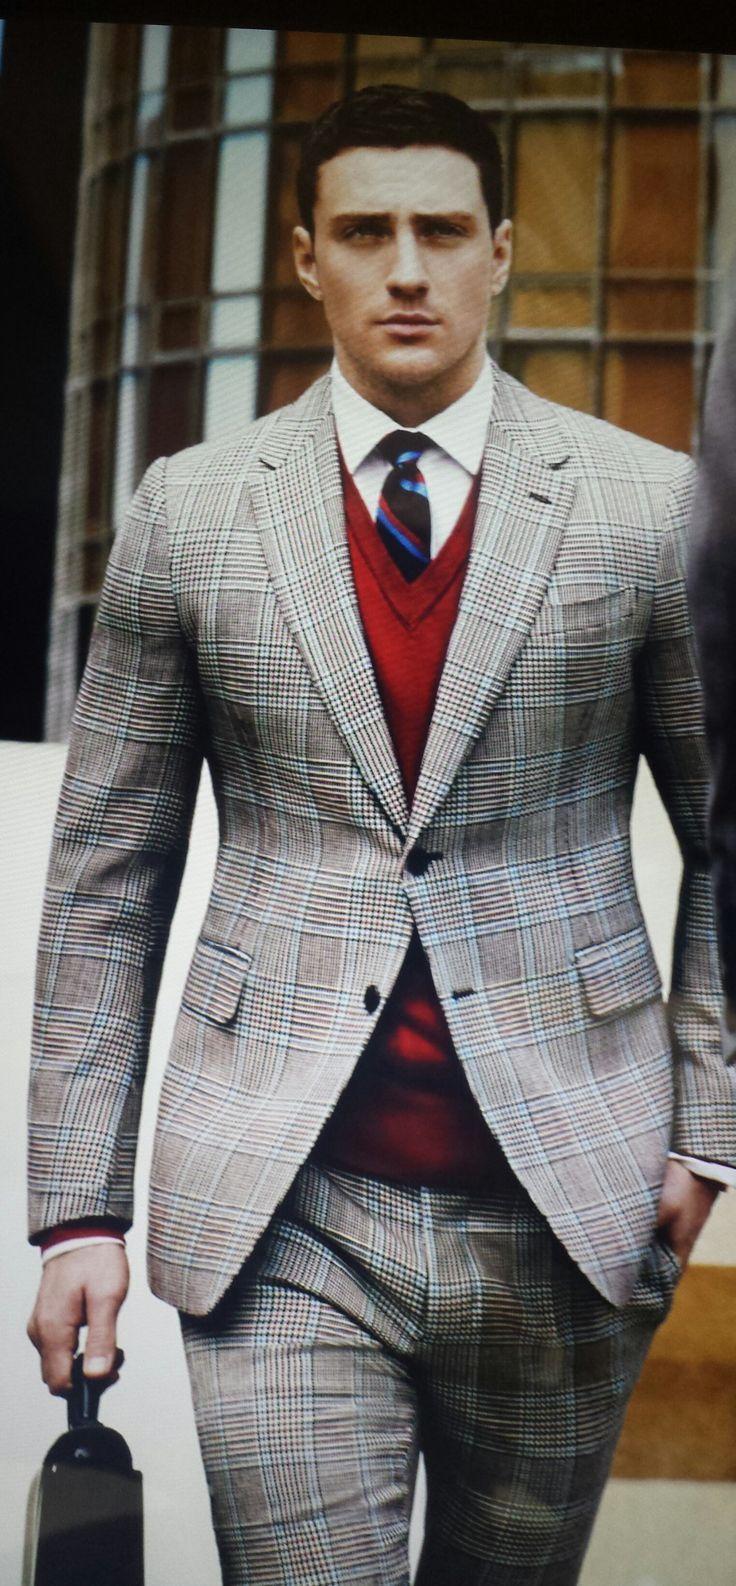 177 best Red, Black, White... images on Pinterest | Menswear ...